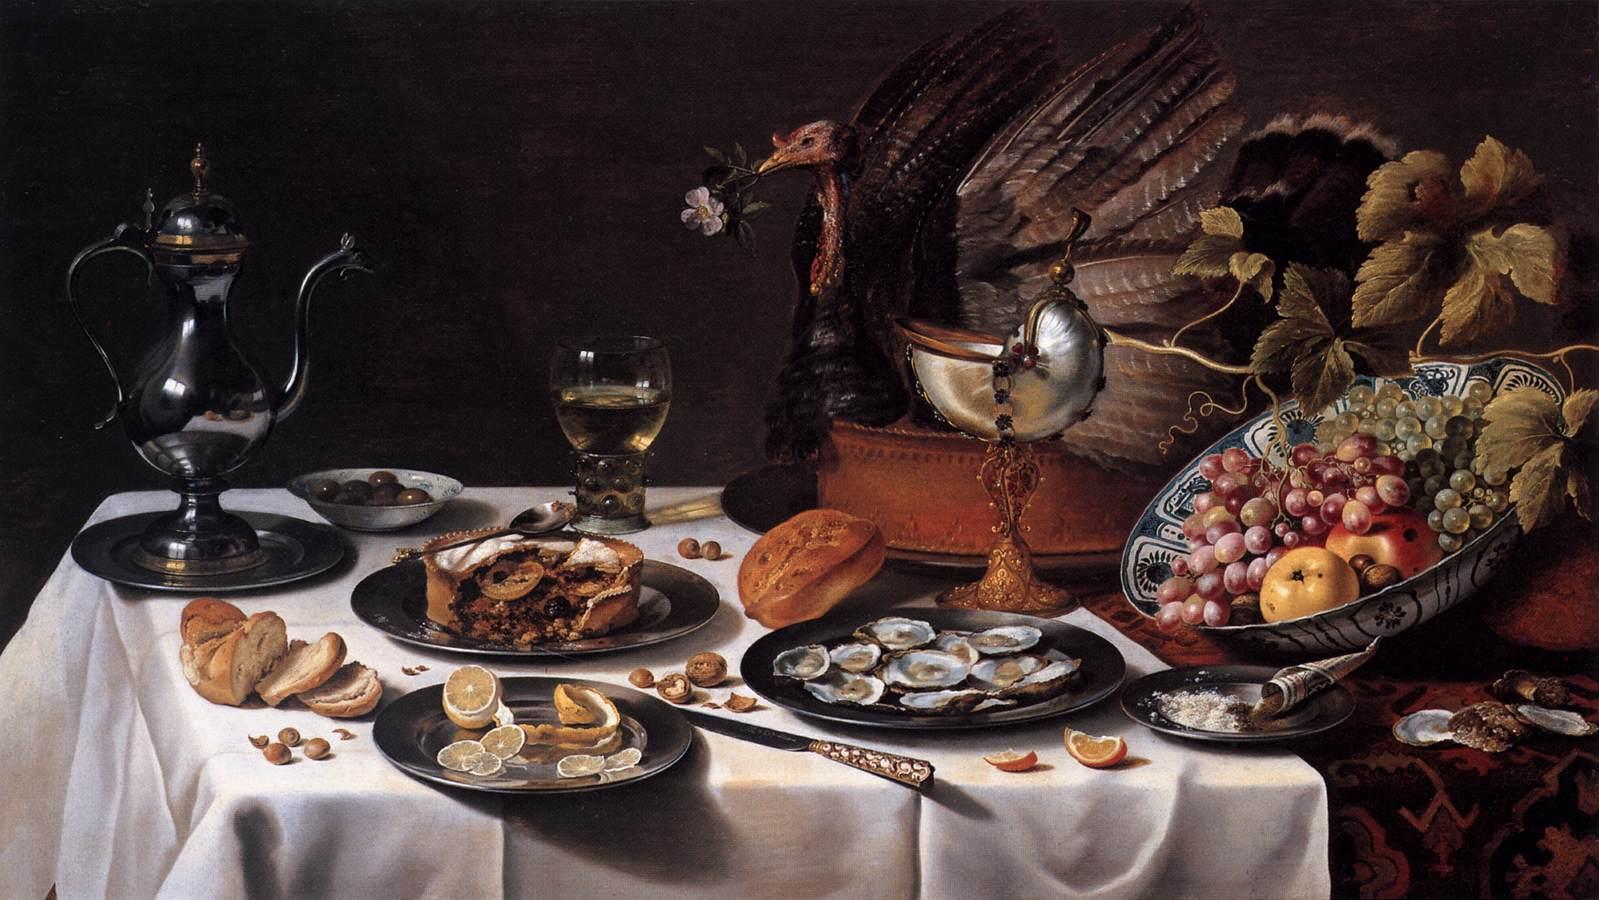 Still Life with Turkey Pie - 1627 - by Pieter Claesz